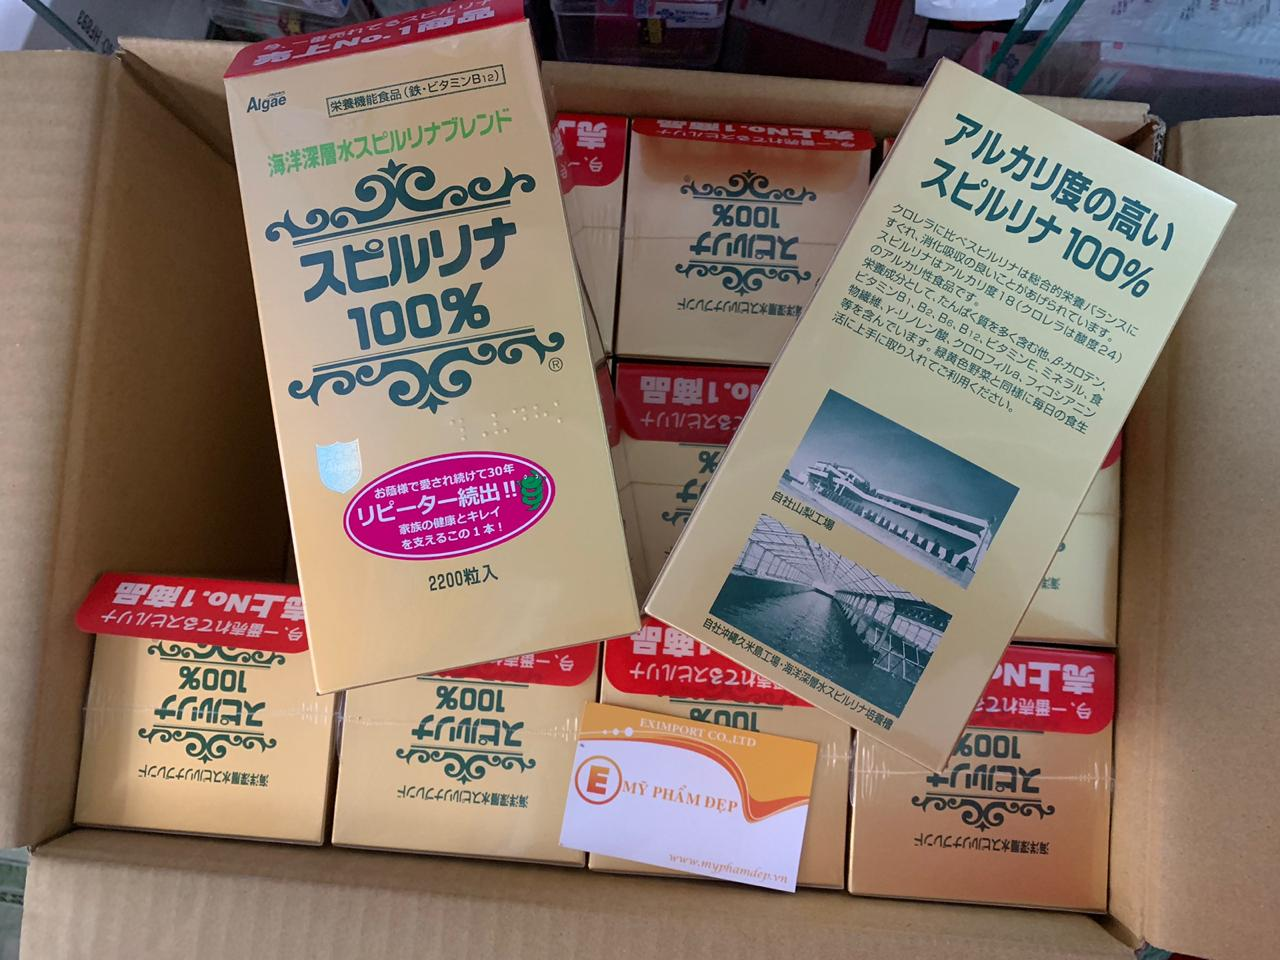 san-pham-lam-dep-khac-tao-xoan-spirulina-nhat-ban-hop-2200-vien-2555